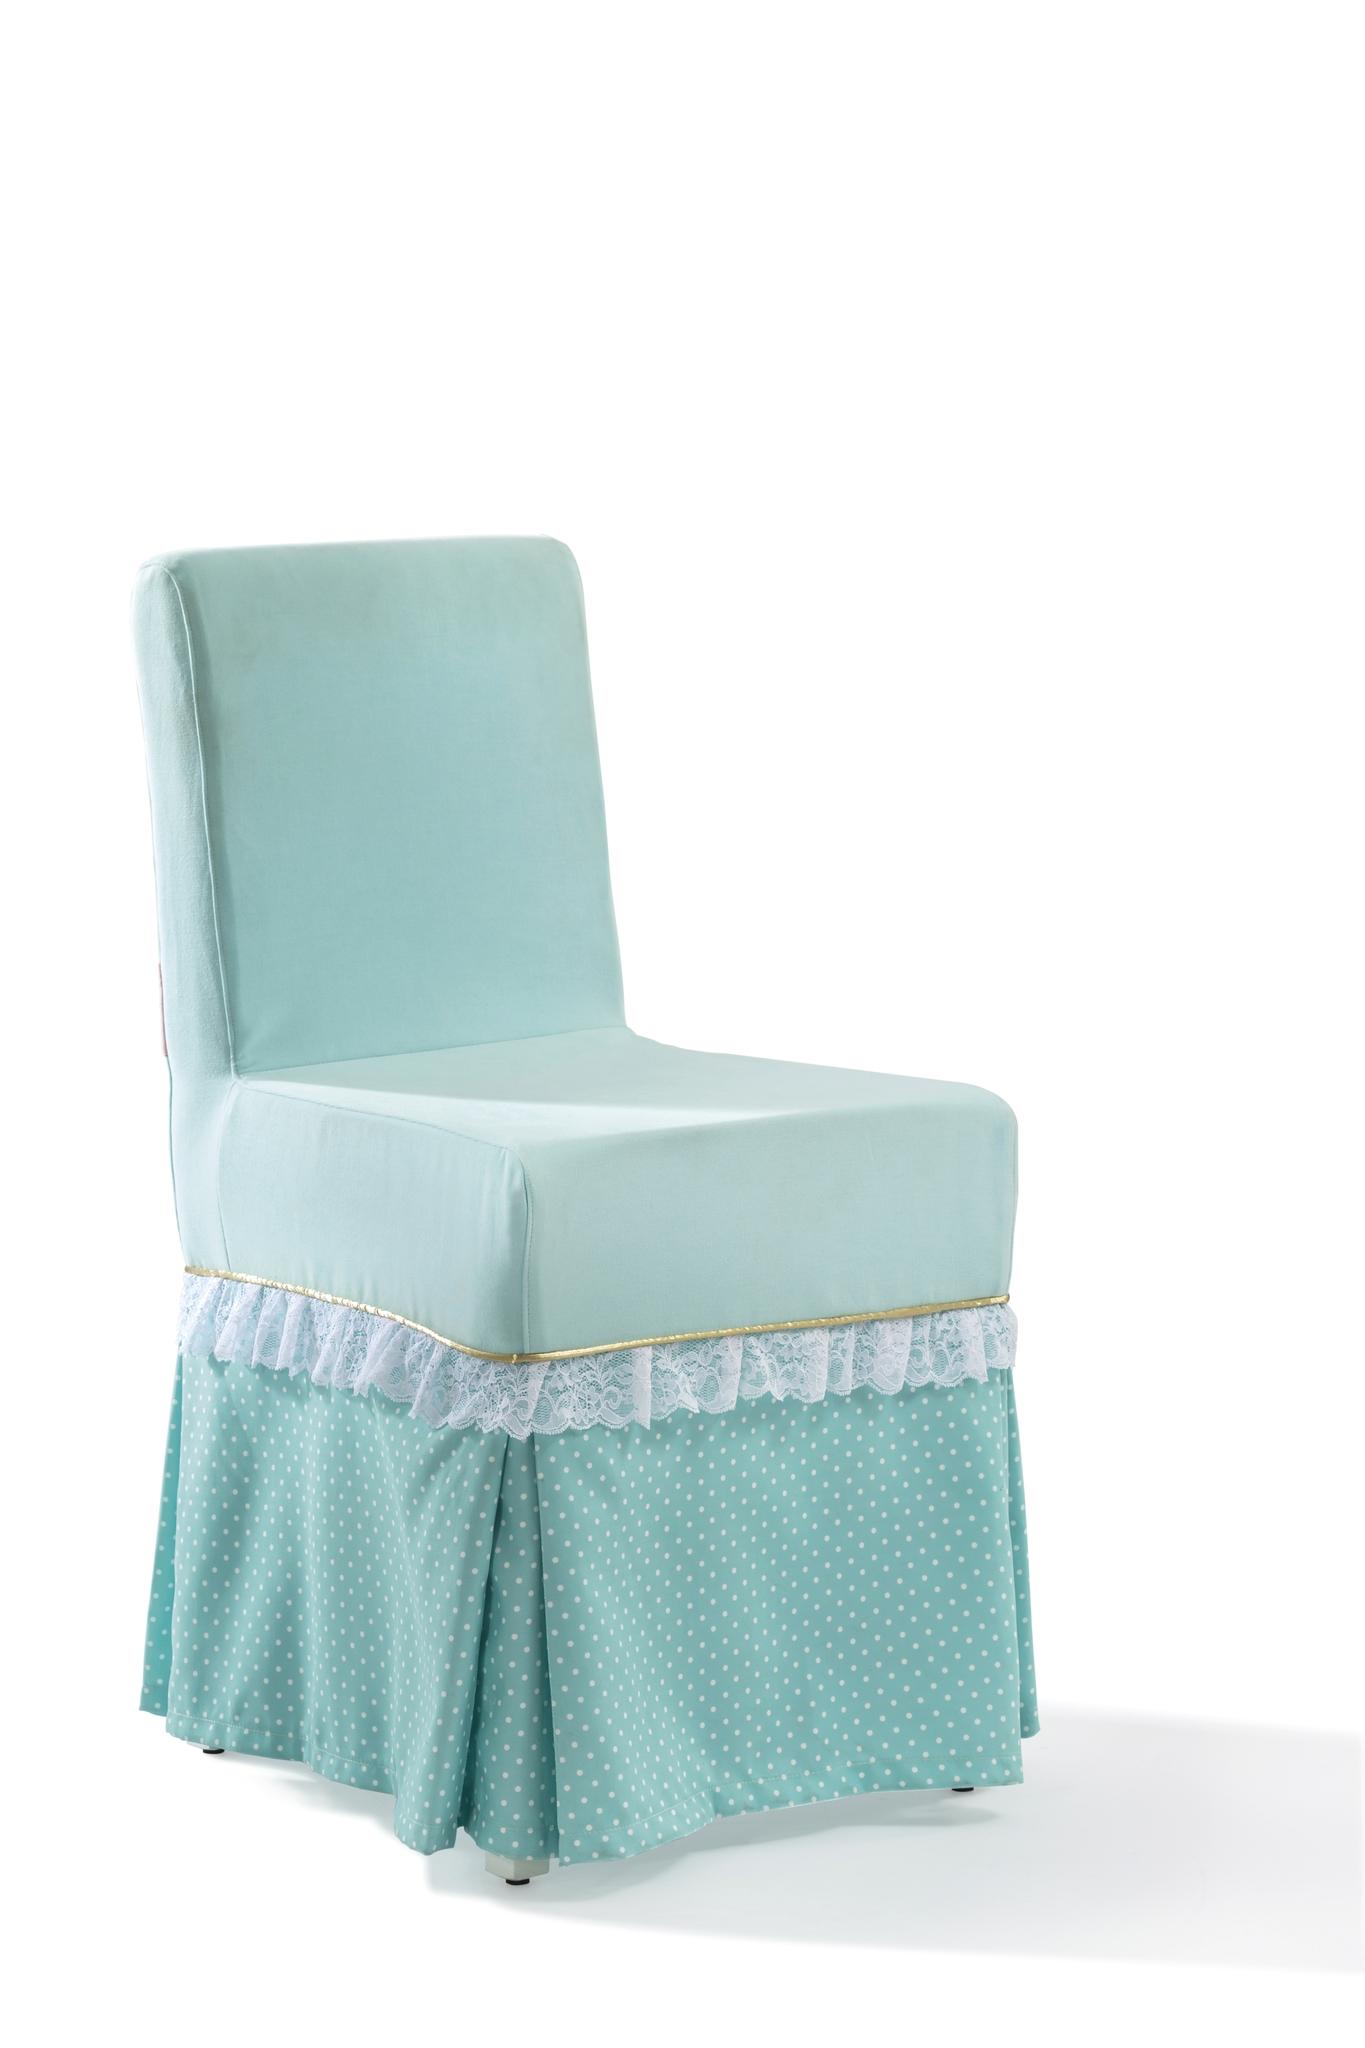 Scaun tapitat cu stofa Paradise Light Turquoise